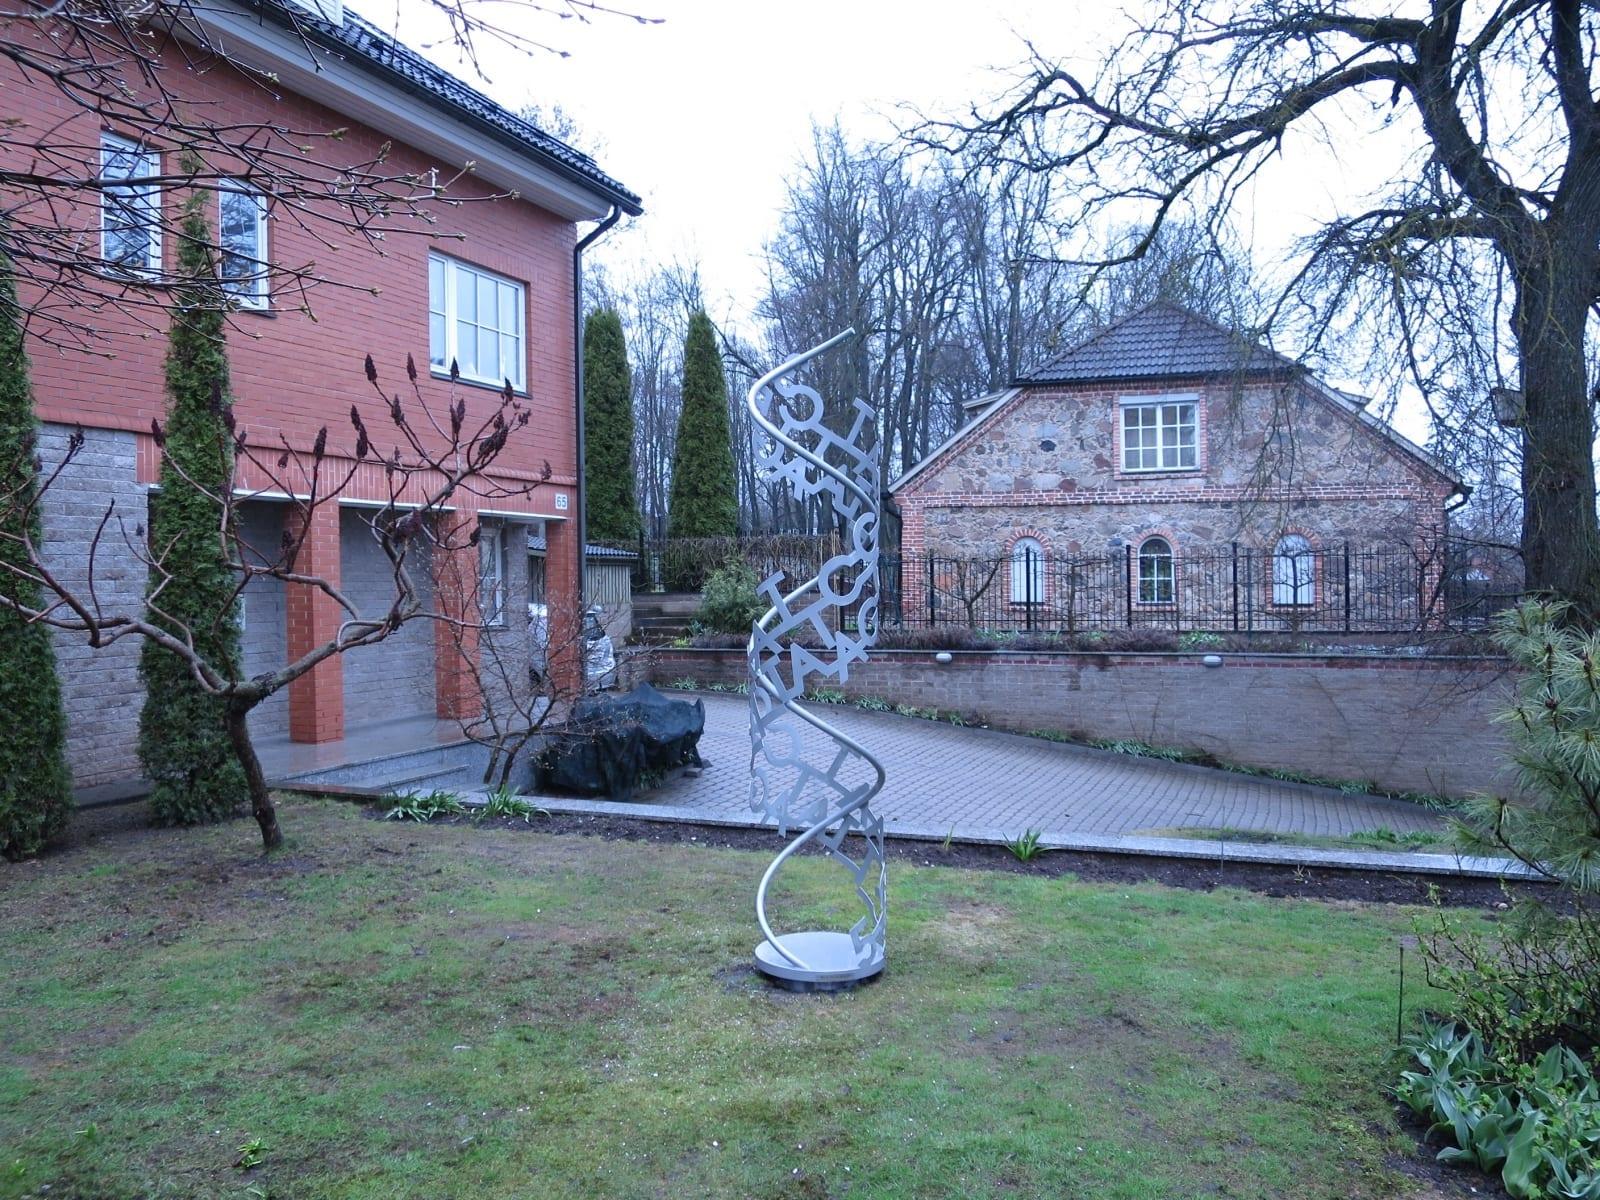 """HELIX"" 2017 roostevaba teras h= 2,5 m, eratellimus Tartu aeda <br/>""HELIX"" 2017 stainless steel h= 2,5 m, private garden in Tartu, Estonia"